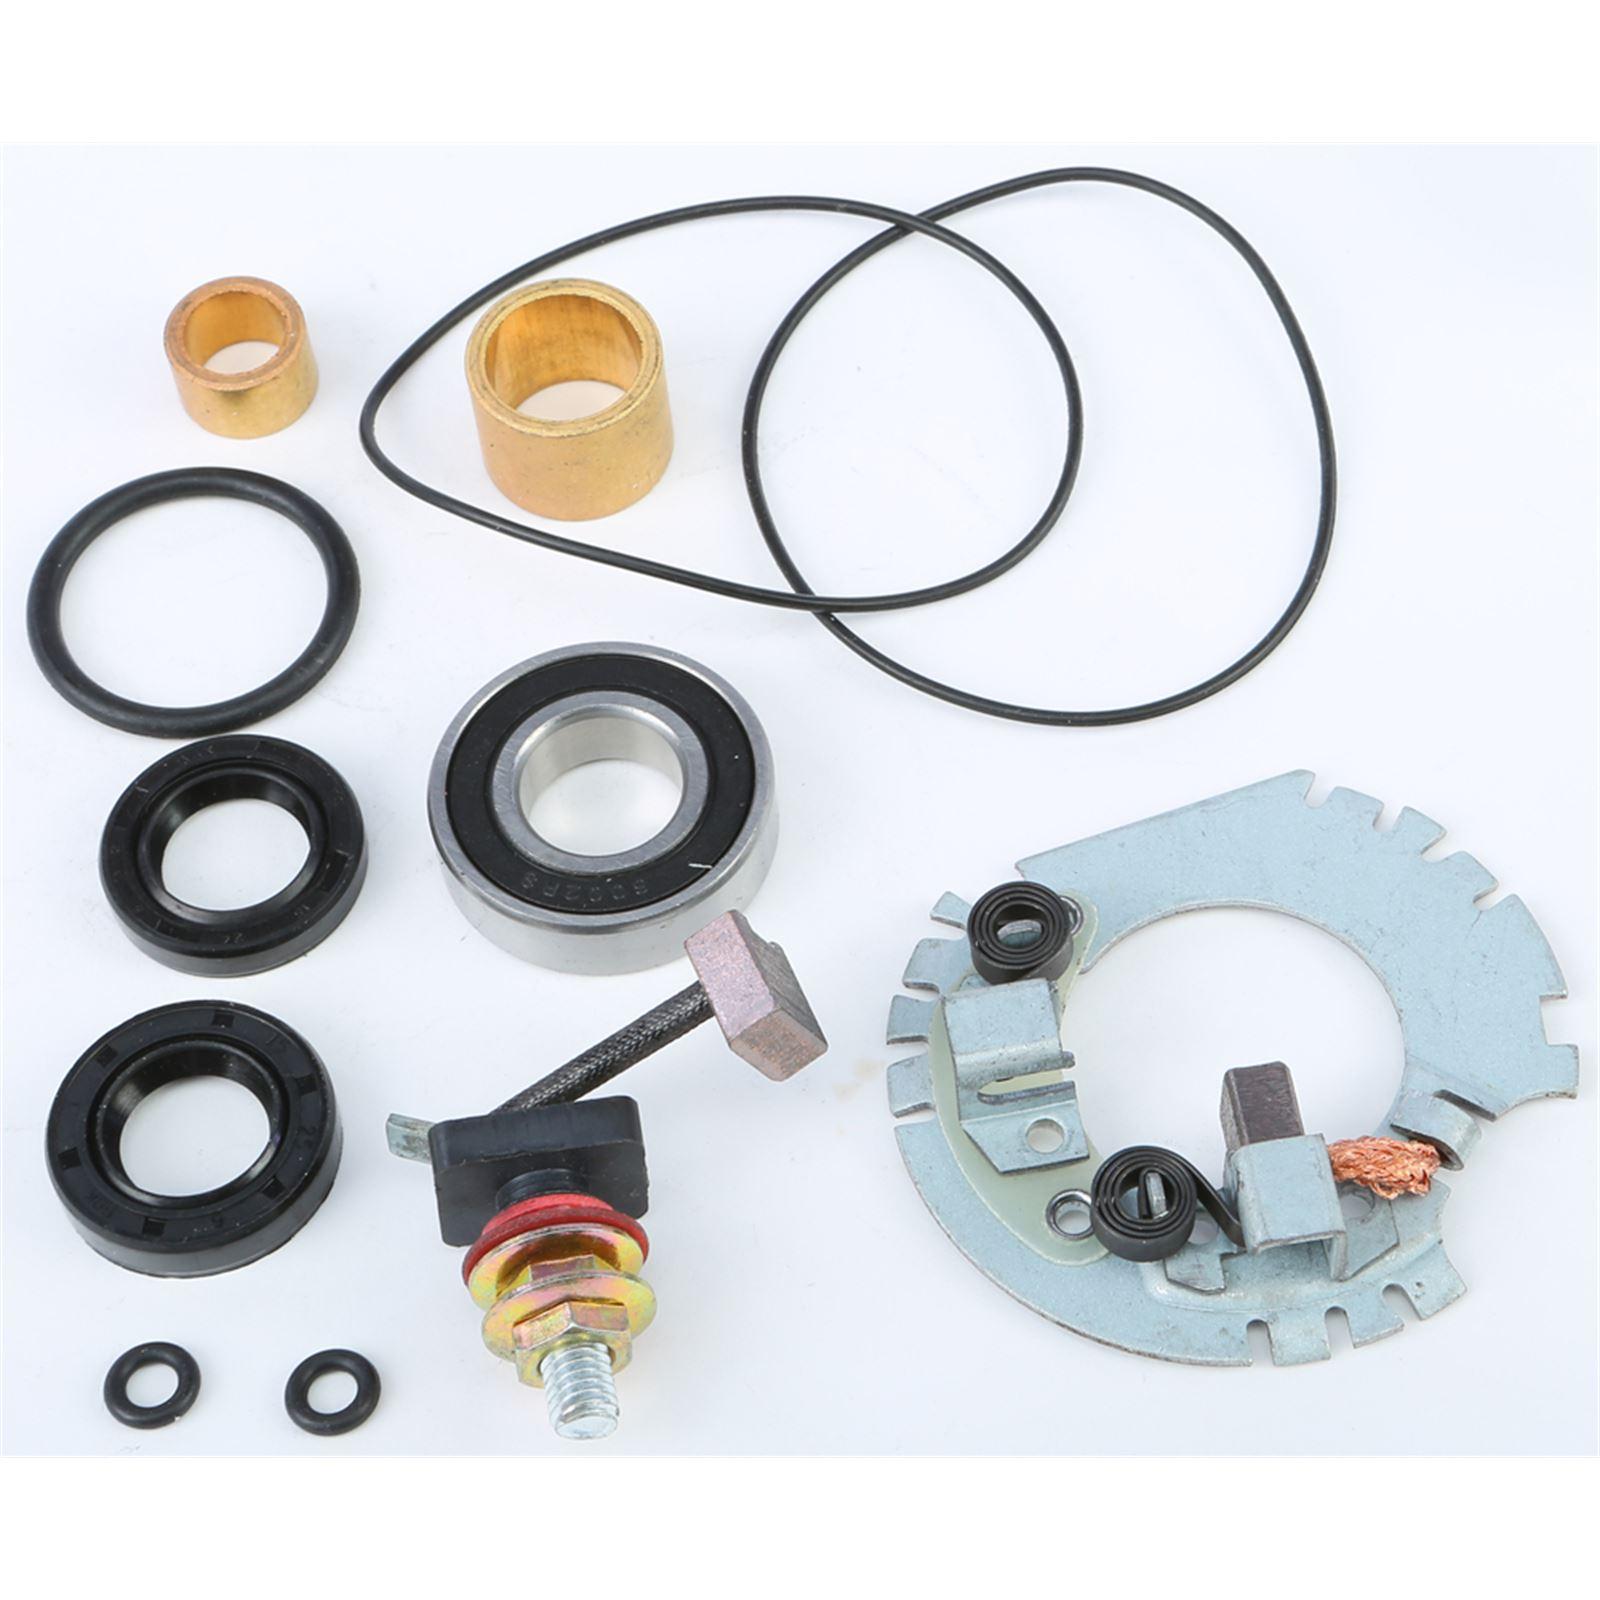 Fire Power Starter Motor Parts Kit